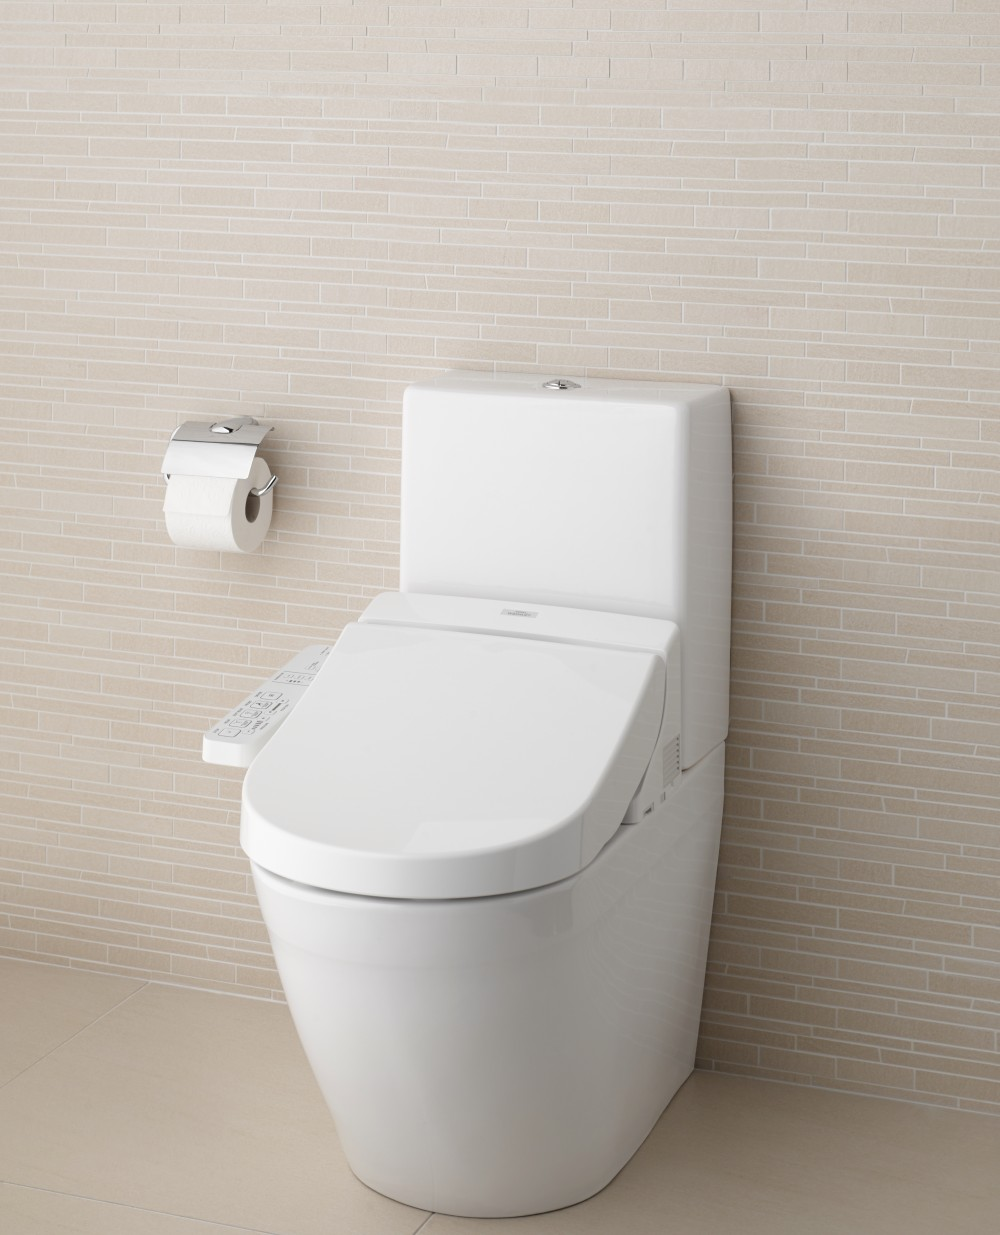 TOTO WASHLET EK Japanese Toilet Bidet Seat Tooaleta - Toto japanese toilet seat